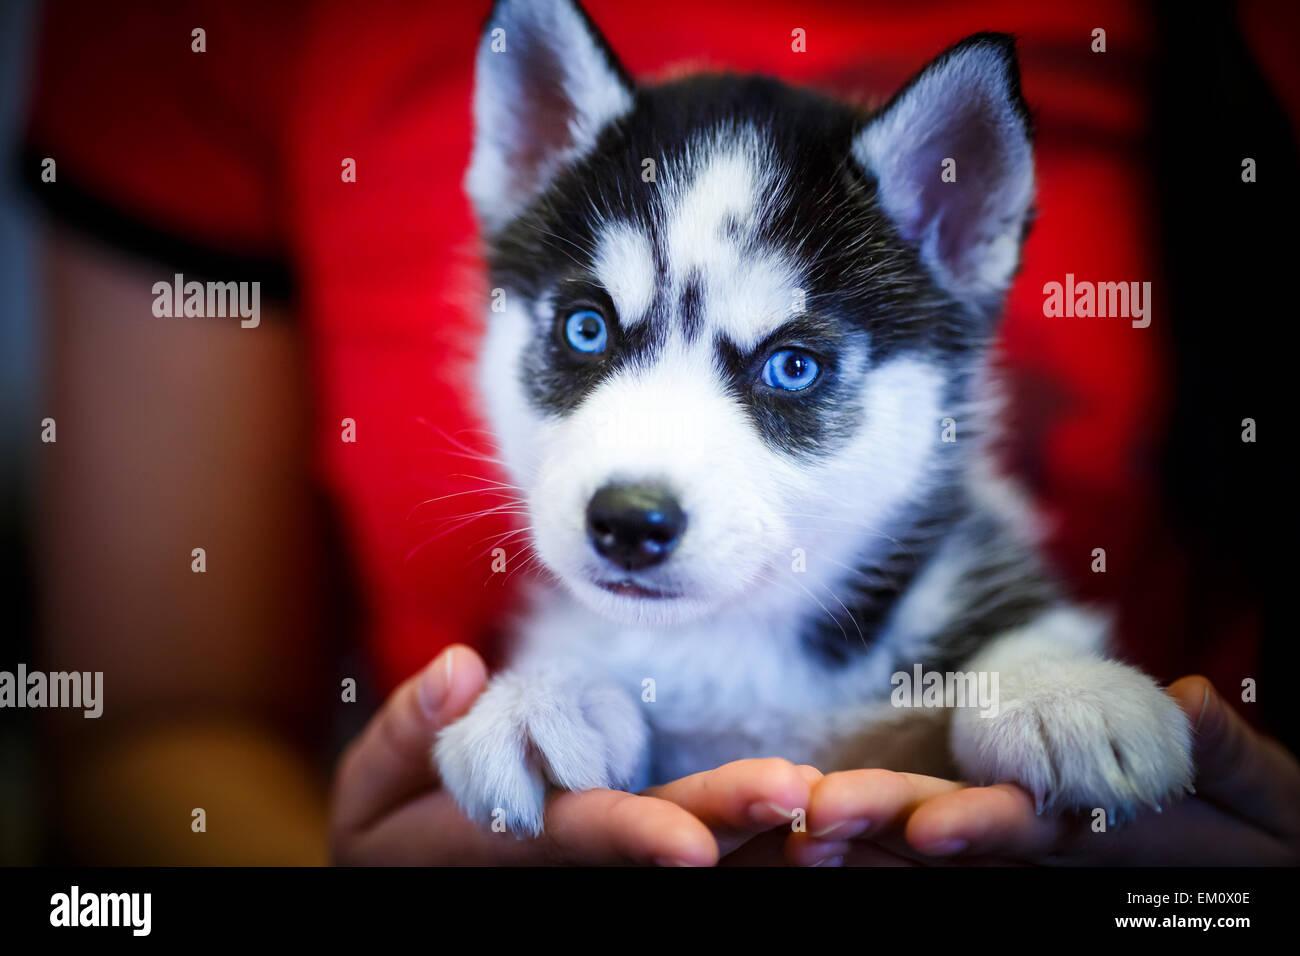 Siberian Husky Dog Blue Eyes Stock Photos Siberian Husky Dog Blue